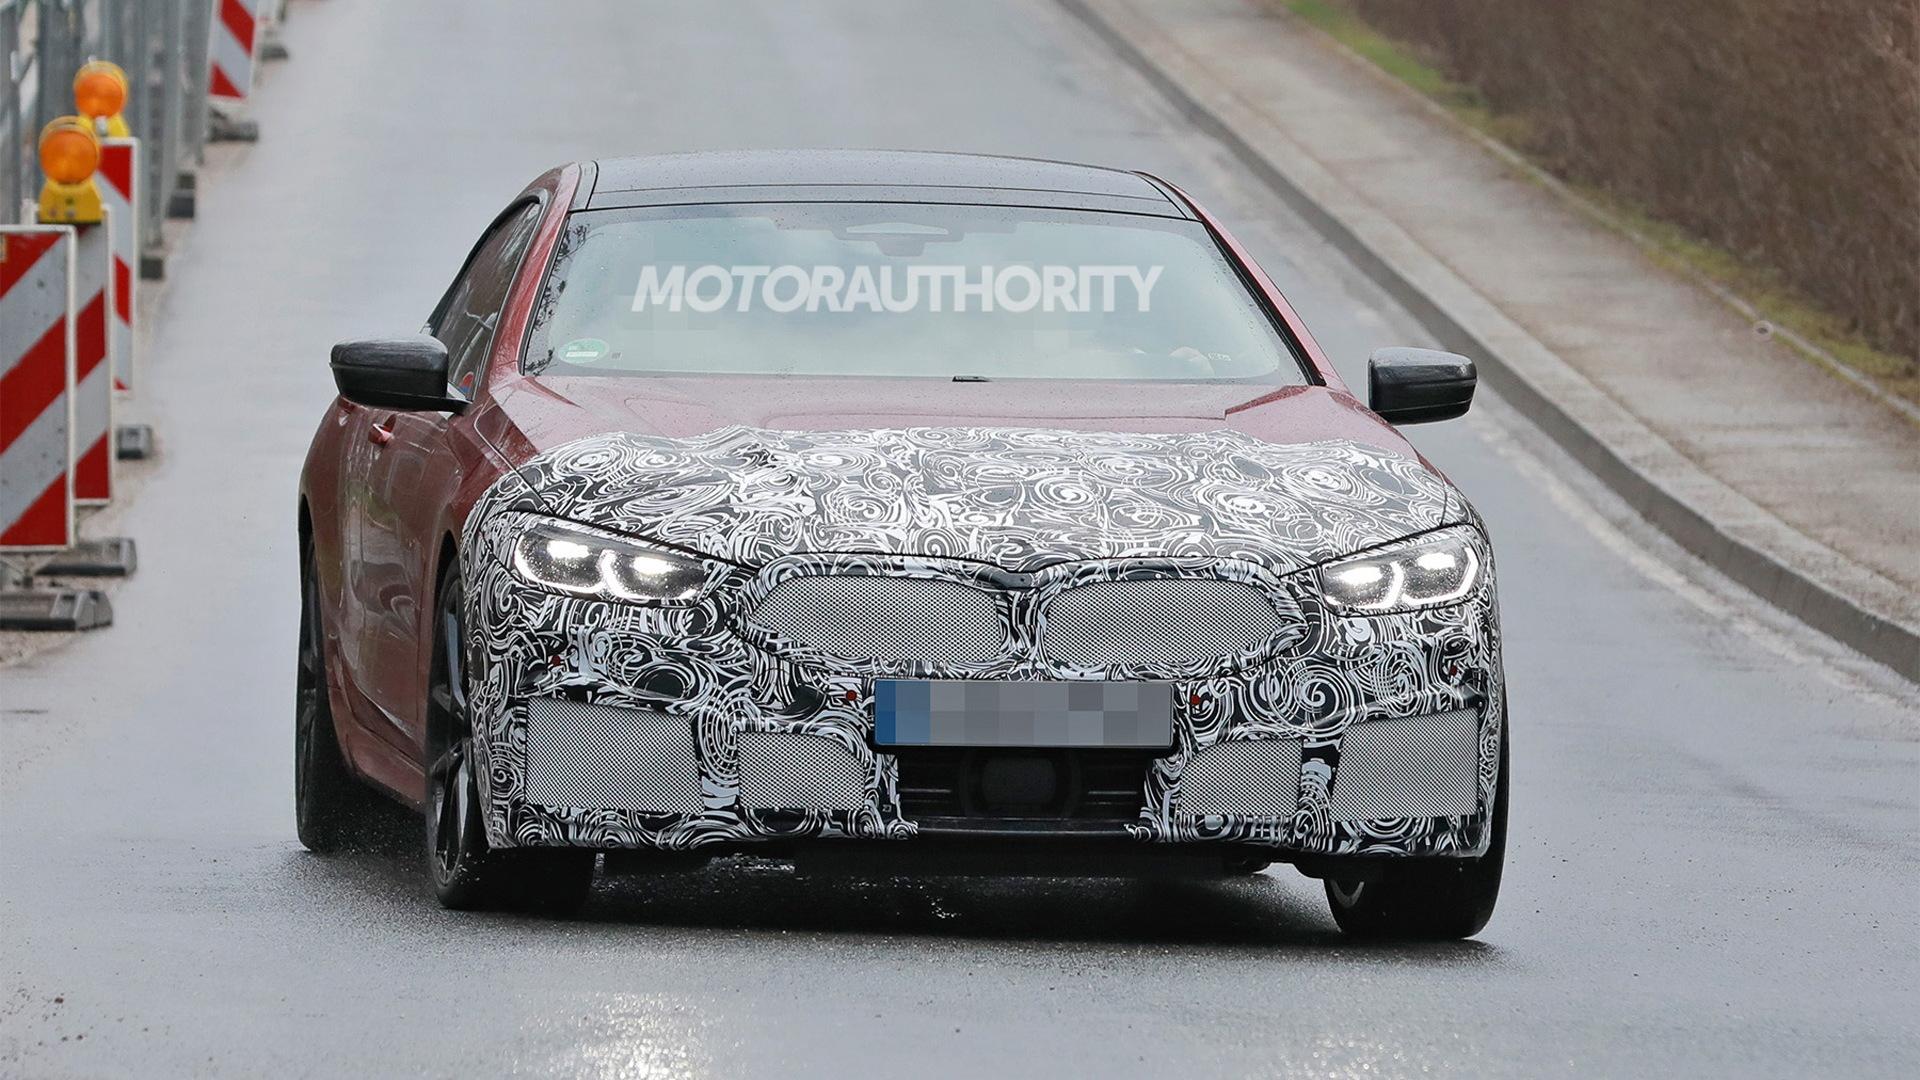 2023 BMW 8-Series Gran Coupe facelift spy shots - Photo credit:S. Baldauf/SB-Medien